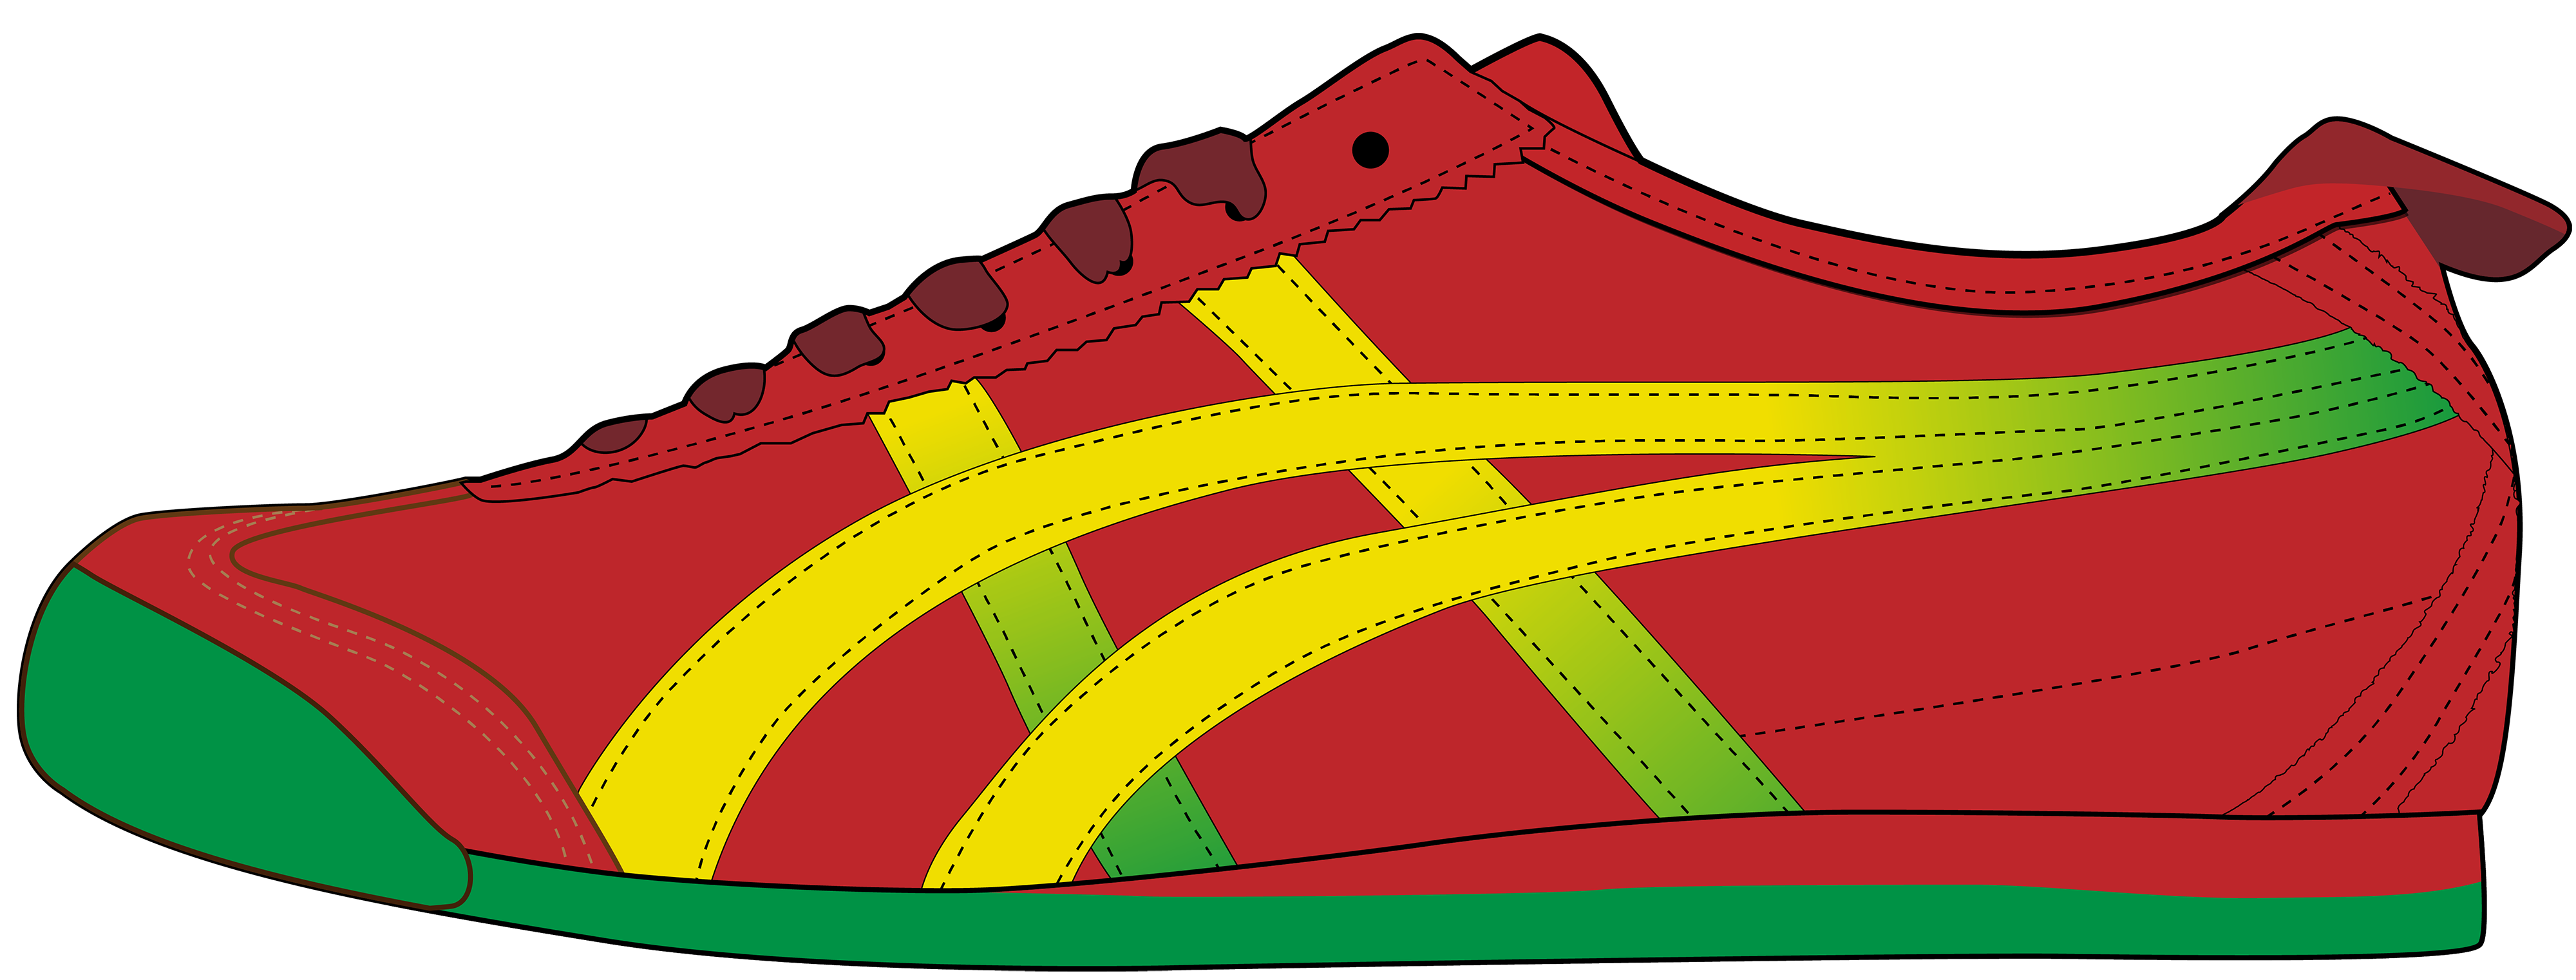 4000x1522 Red Men Sport Shoe Png Clipart